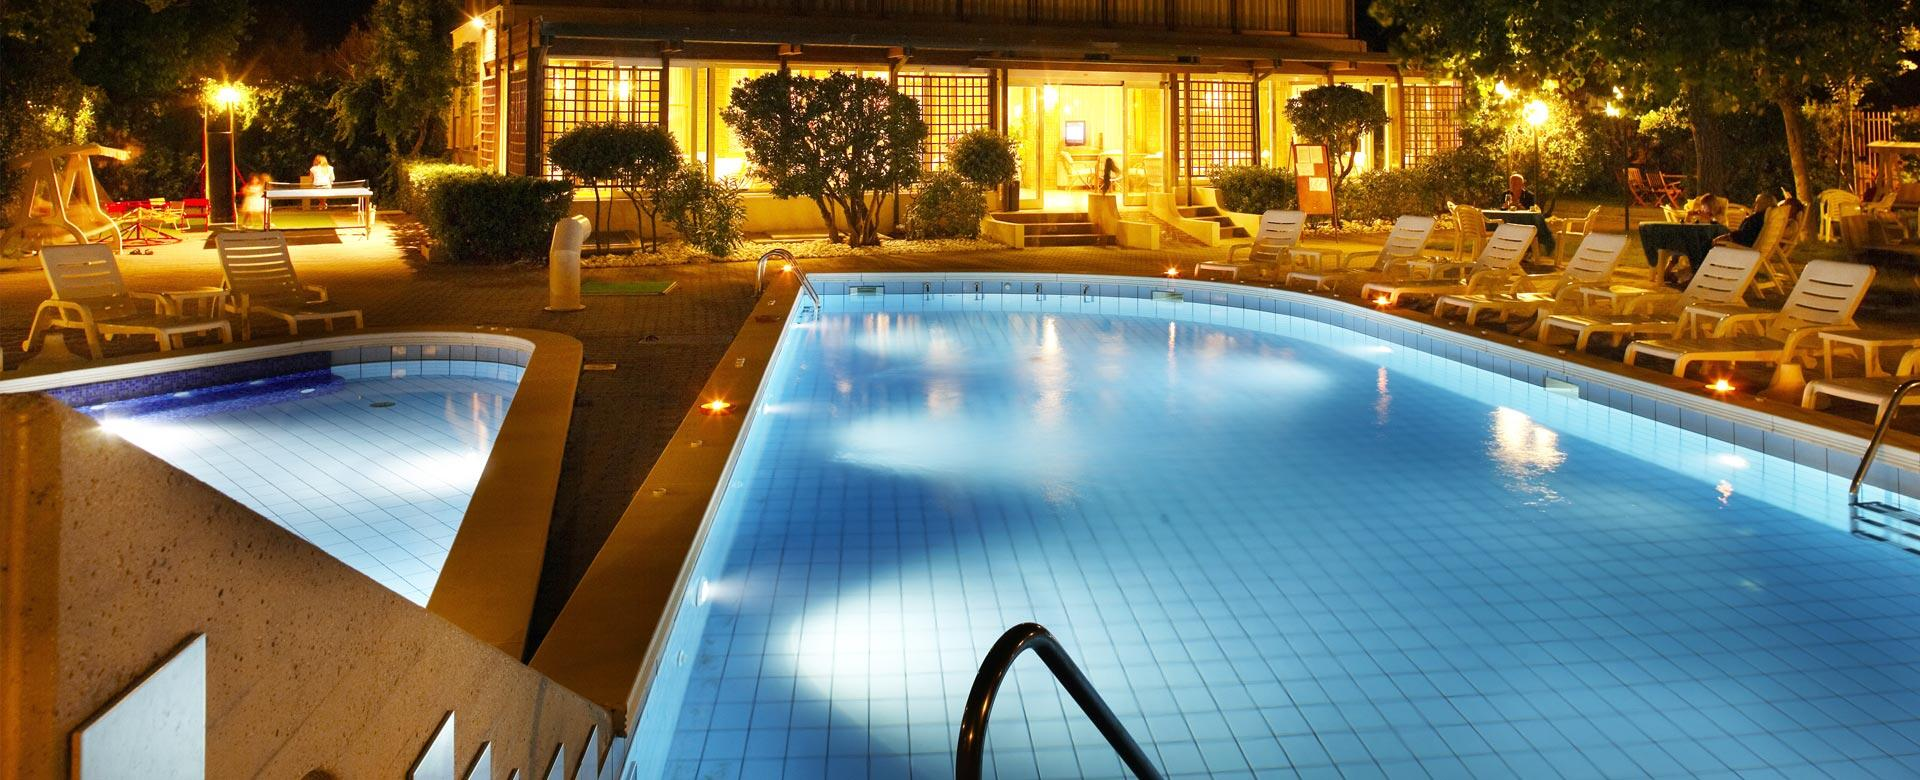 alexandraplaza en hotel-pool-riccione 003